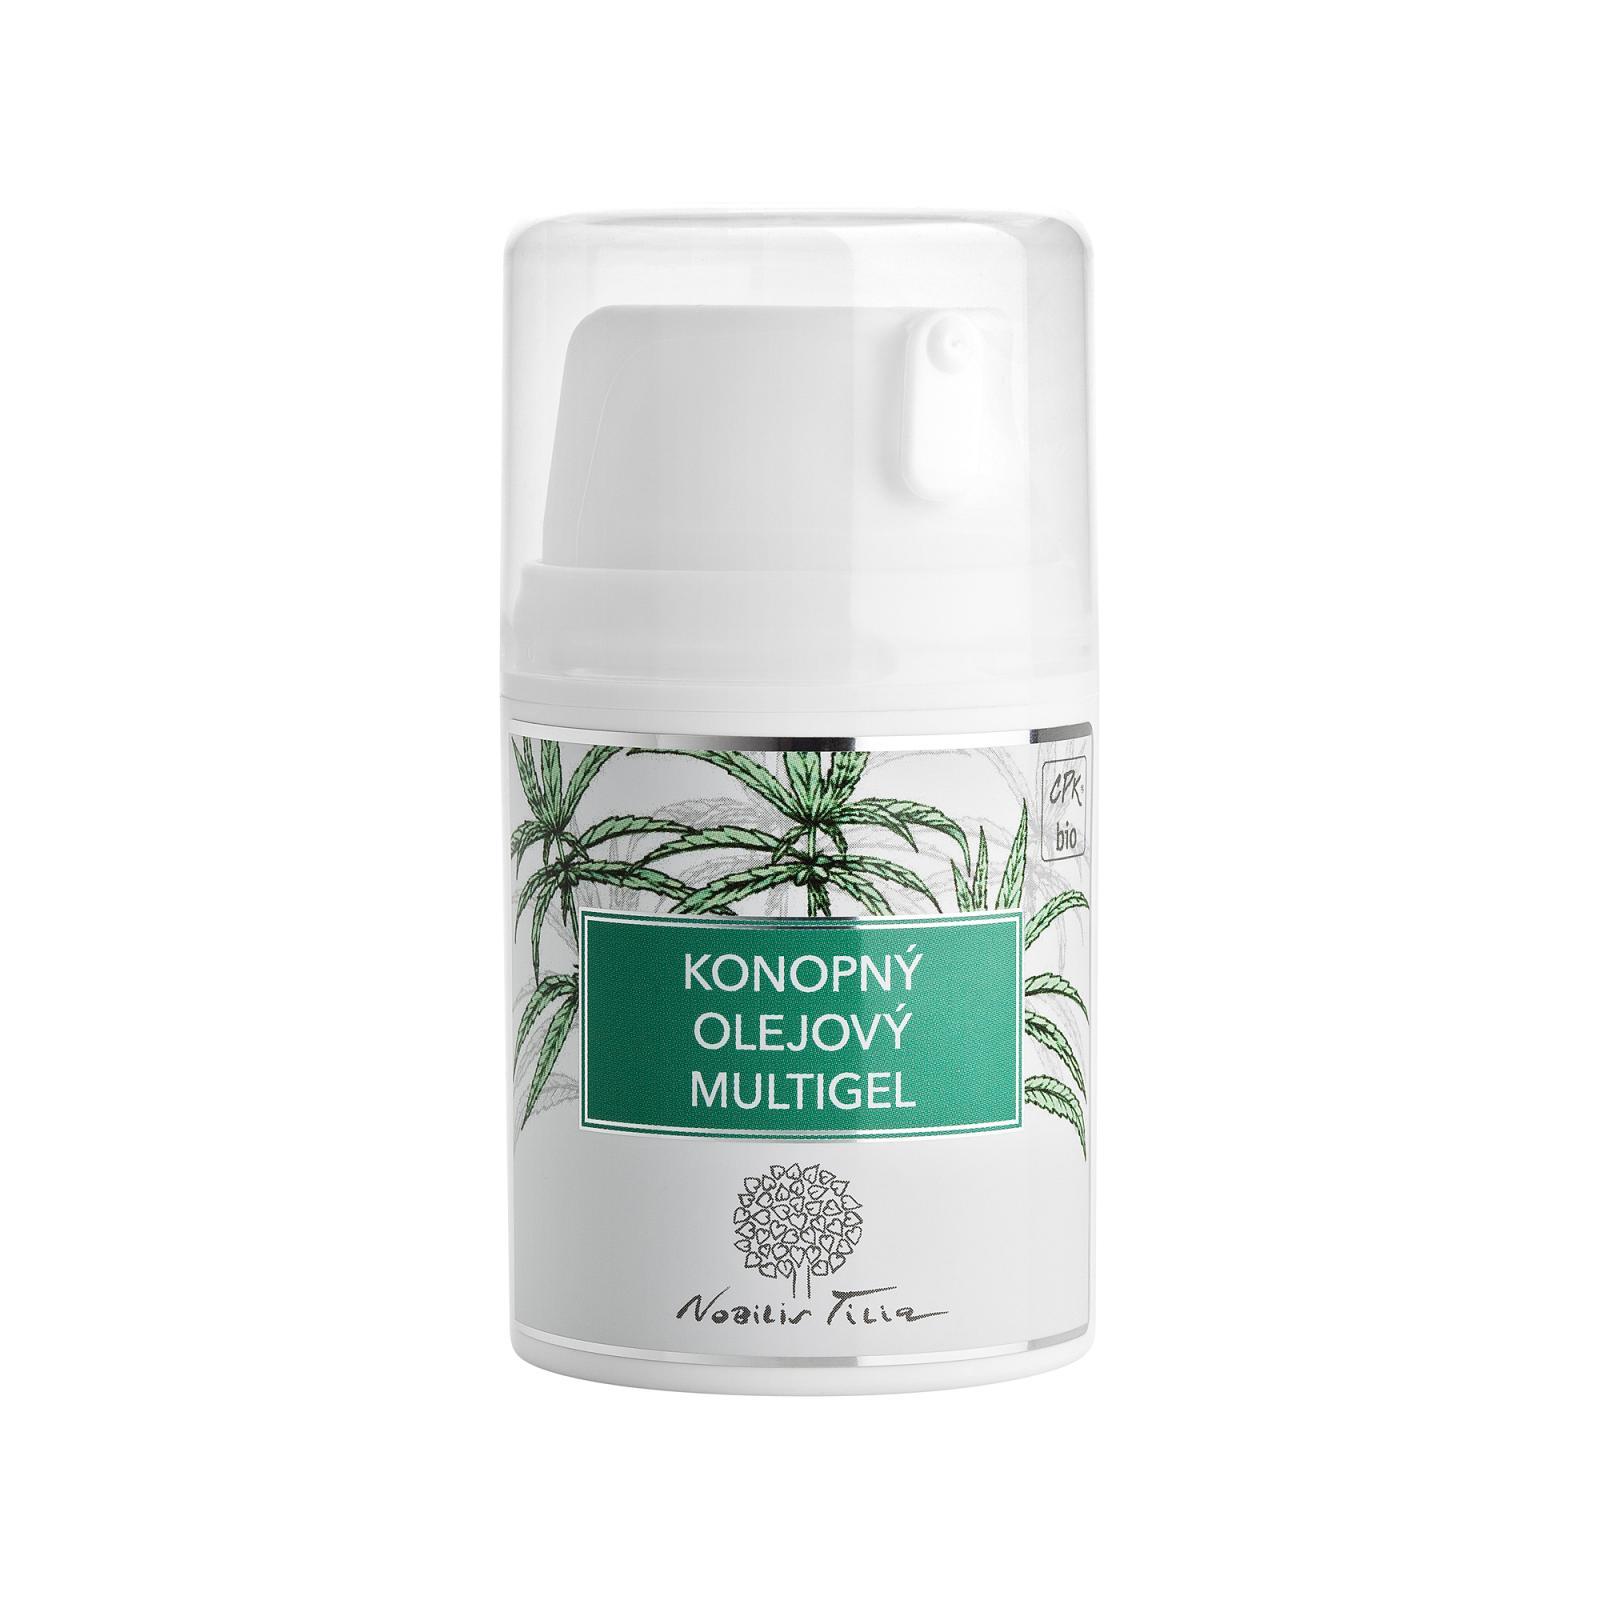 Nobilis Tilia Konopný olejový multigel 50 ml